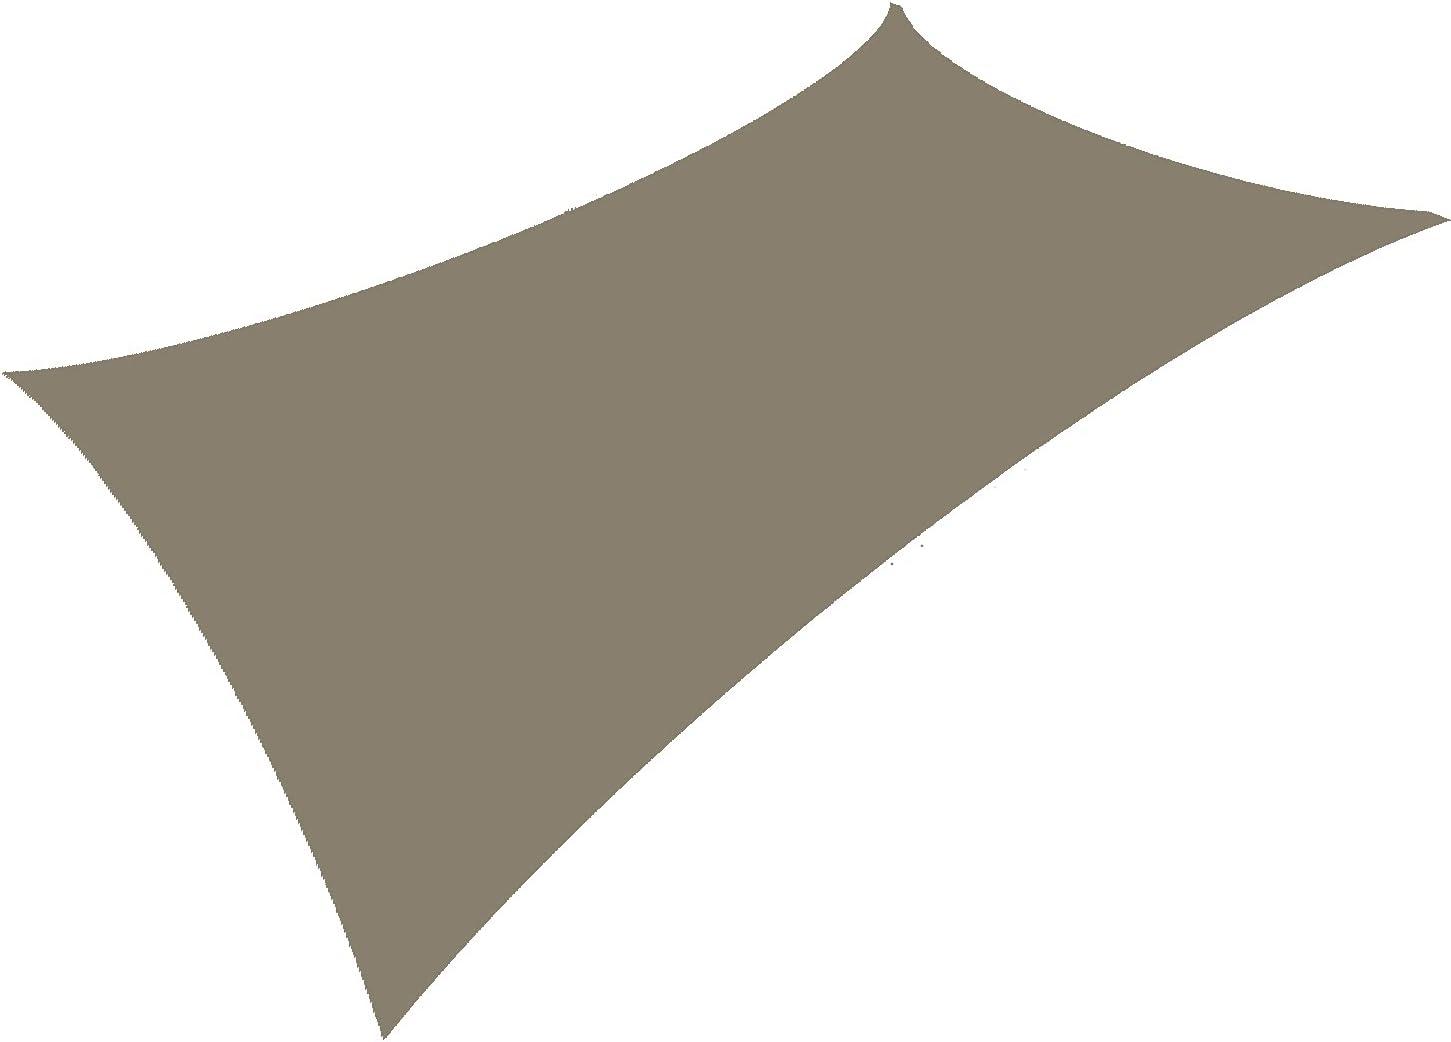 10'×13' Khaki Rectangle Waterproof Sun Los Angeles Mall Popular products UV Canopy Shade Sail Bloc